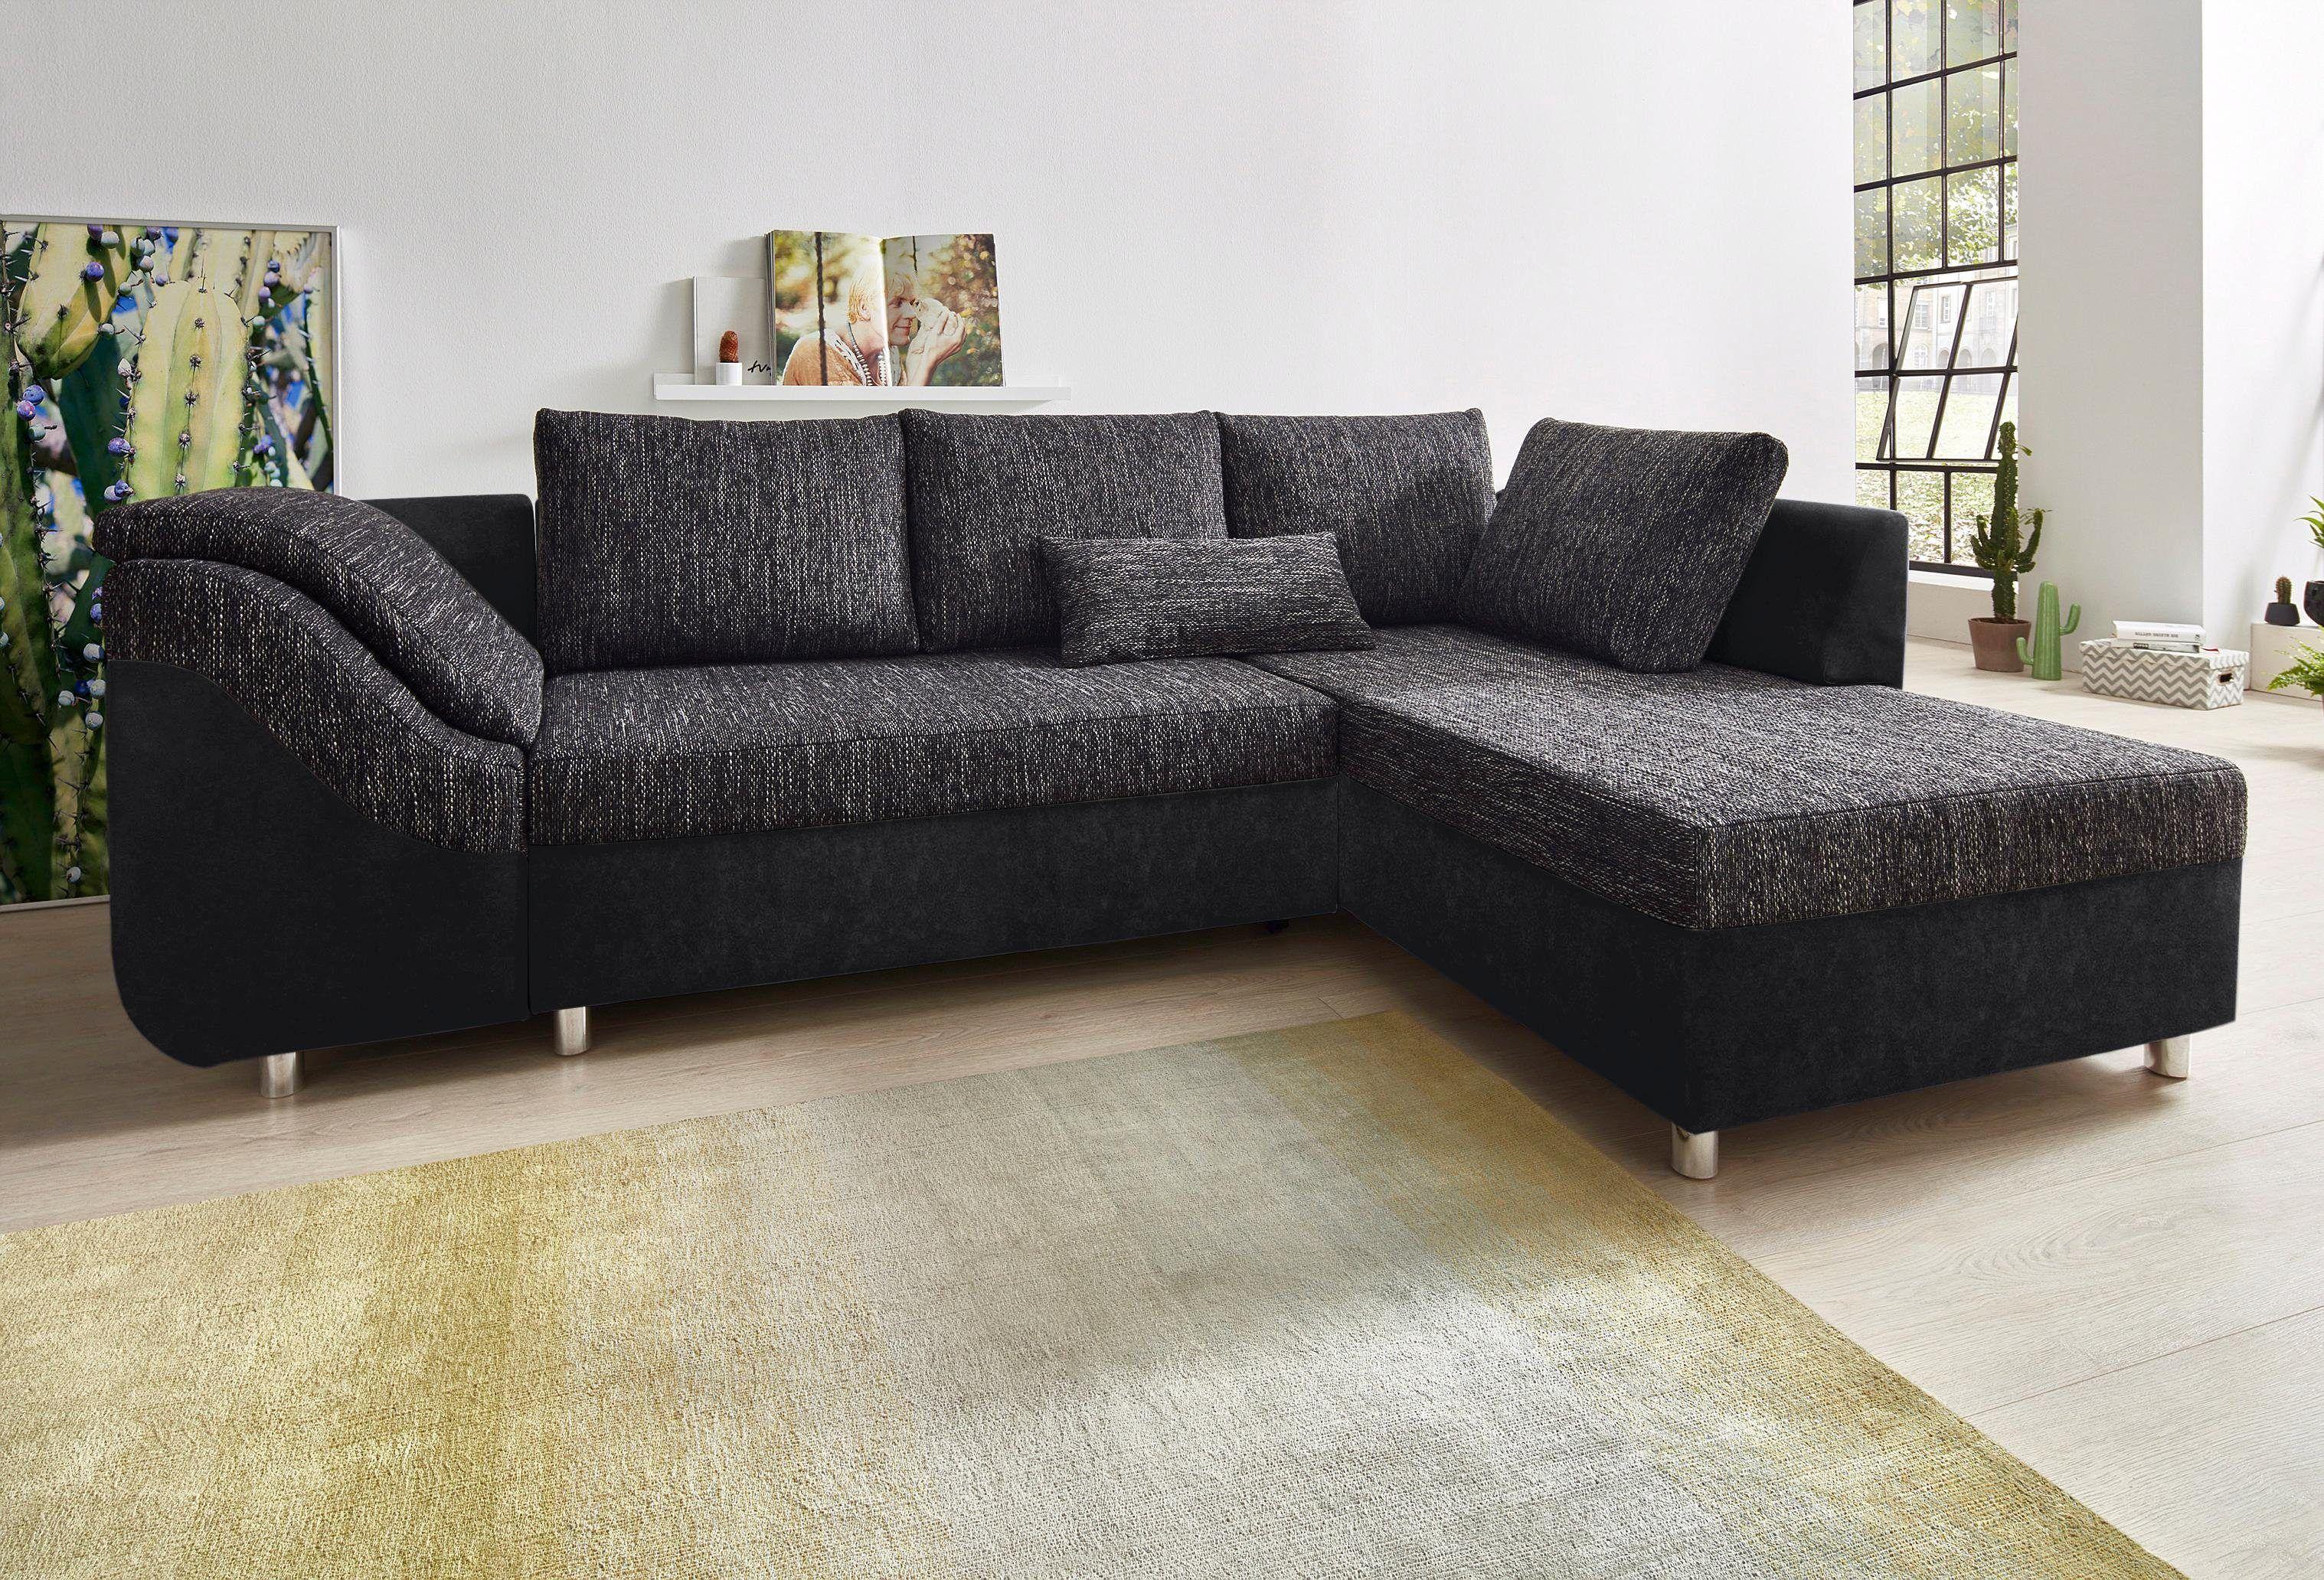 Modernes Ledercouch Sofa Couch Sofa Design Home